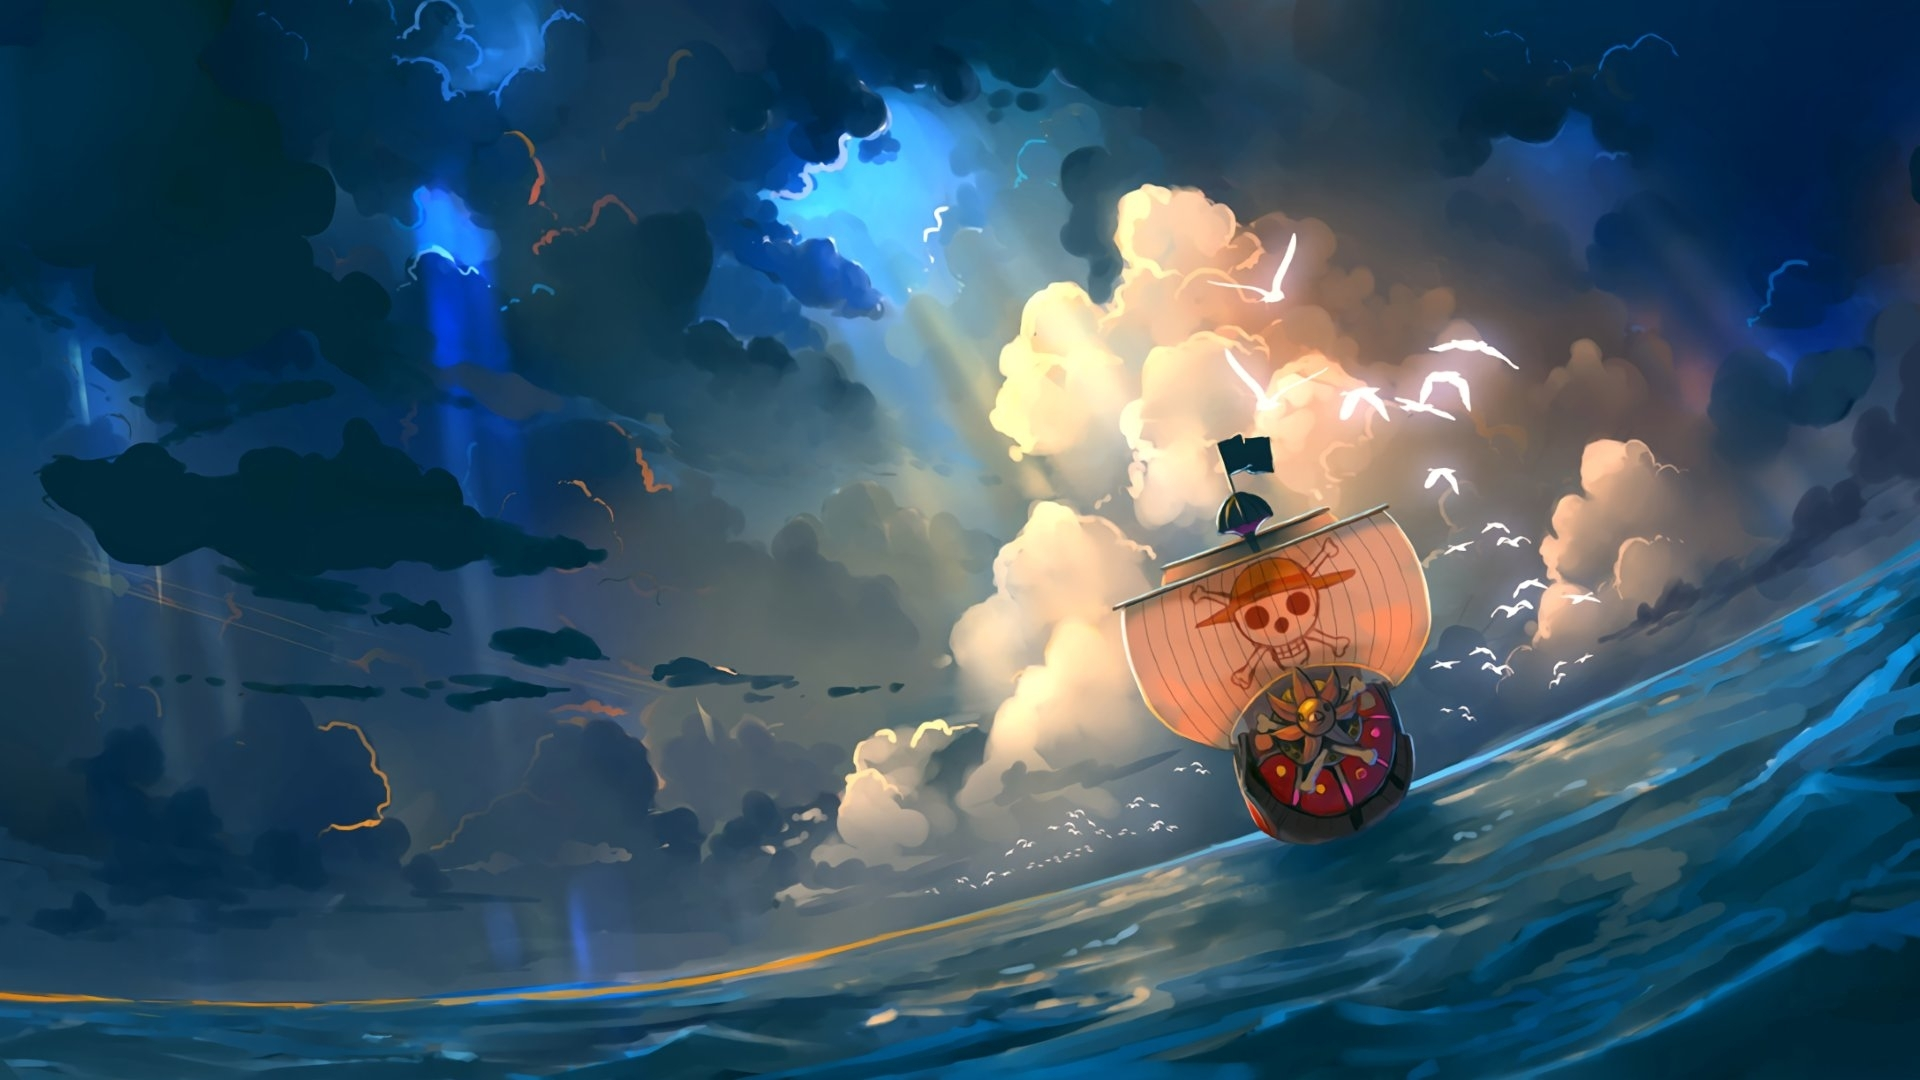 1920x1080 One Piece Anime Artwork Laptop Full HD 1080P HD ...